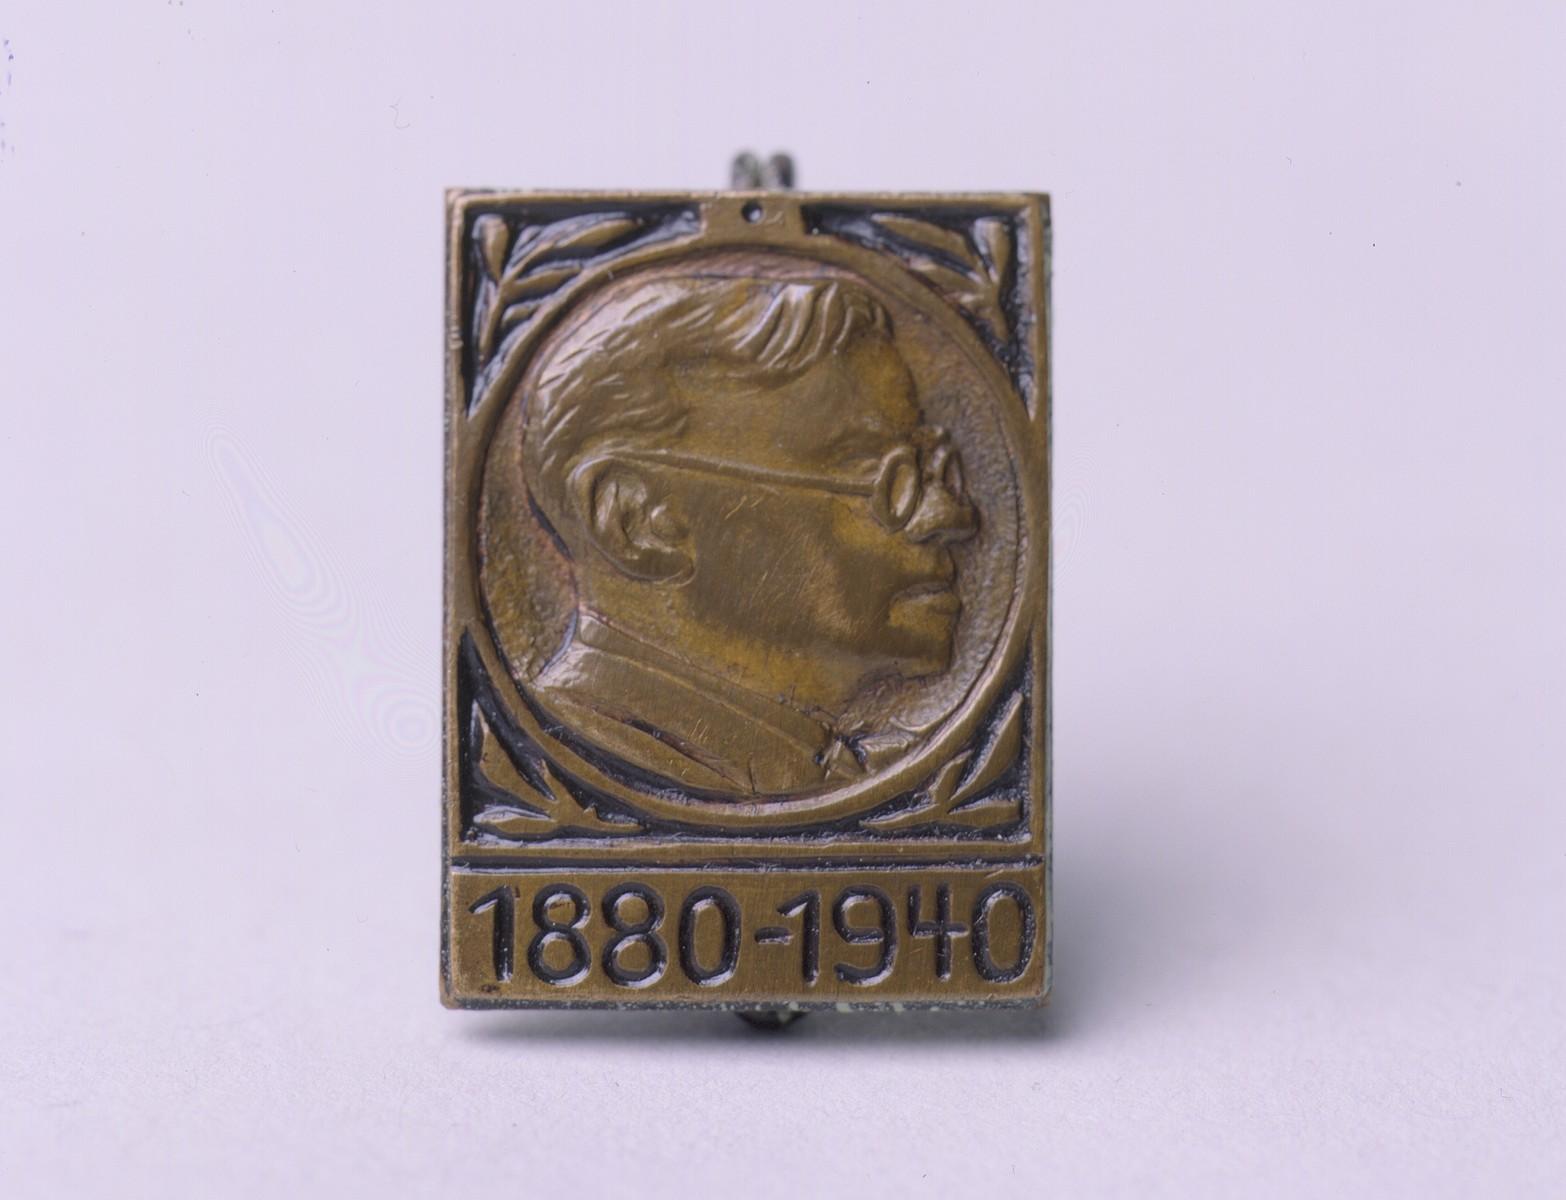 Rectangular Betar Zionist youth movement pin with the raised profile of founder Vladimir Jabotinsky, (1880-1940).